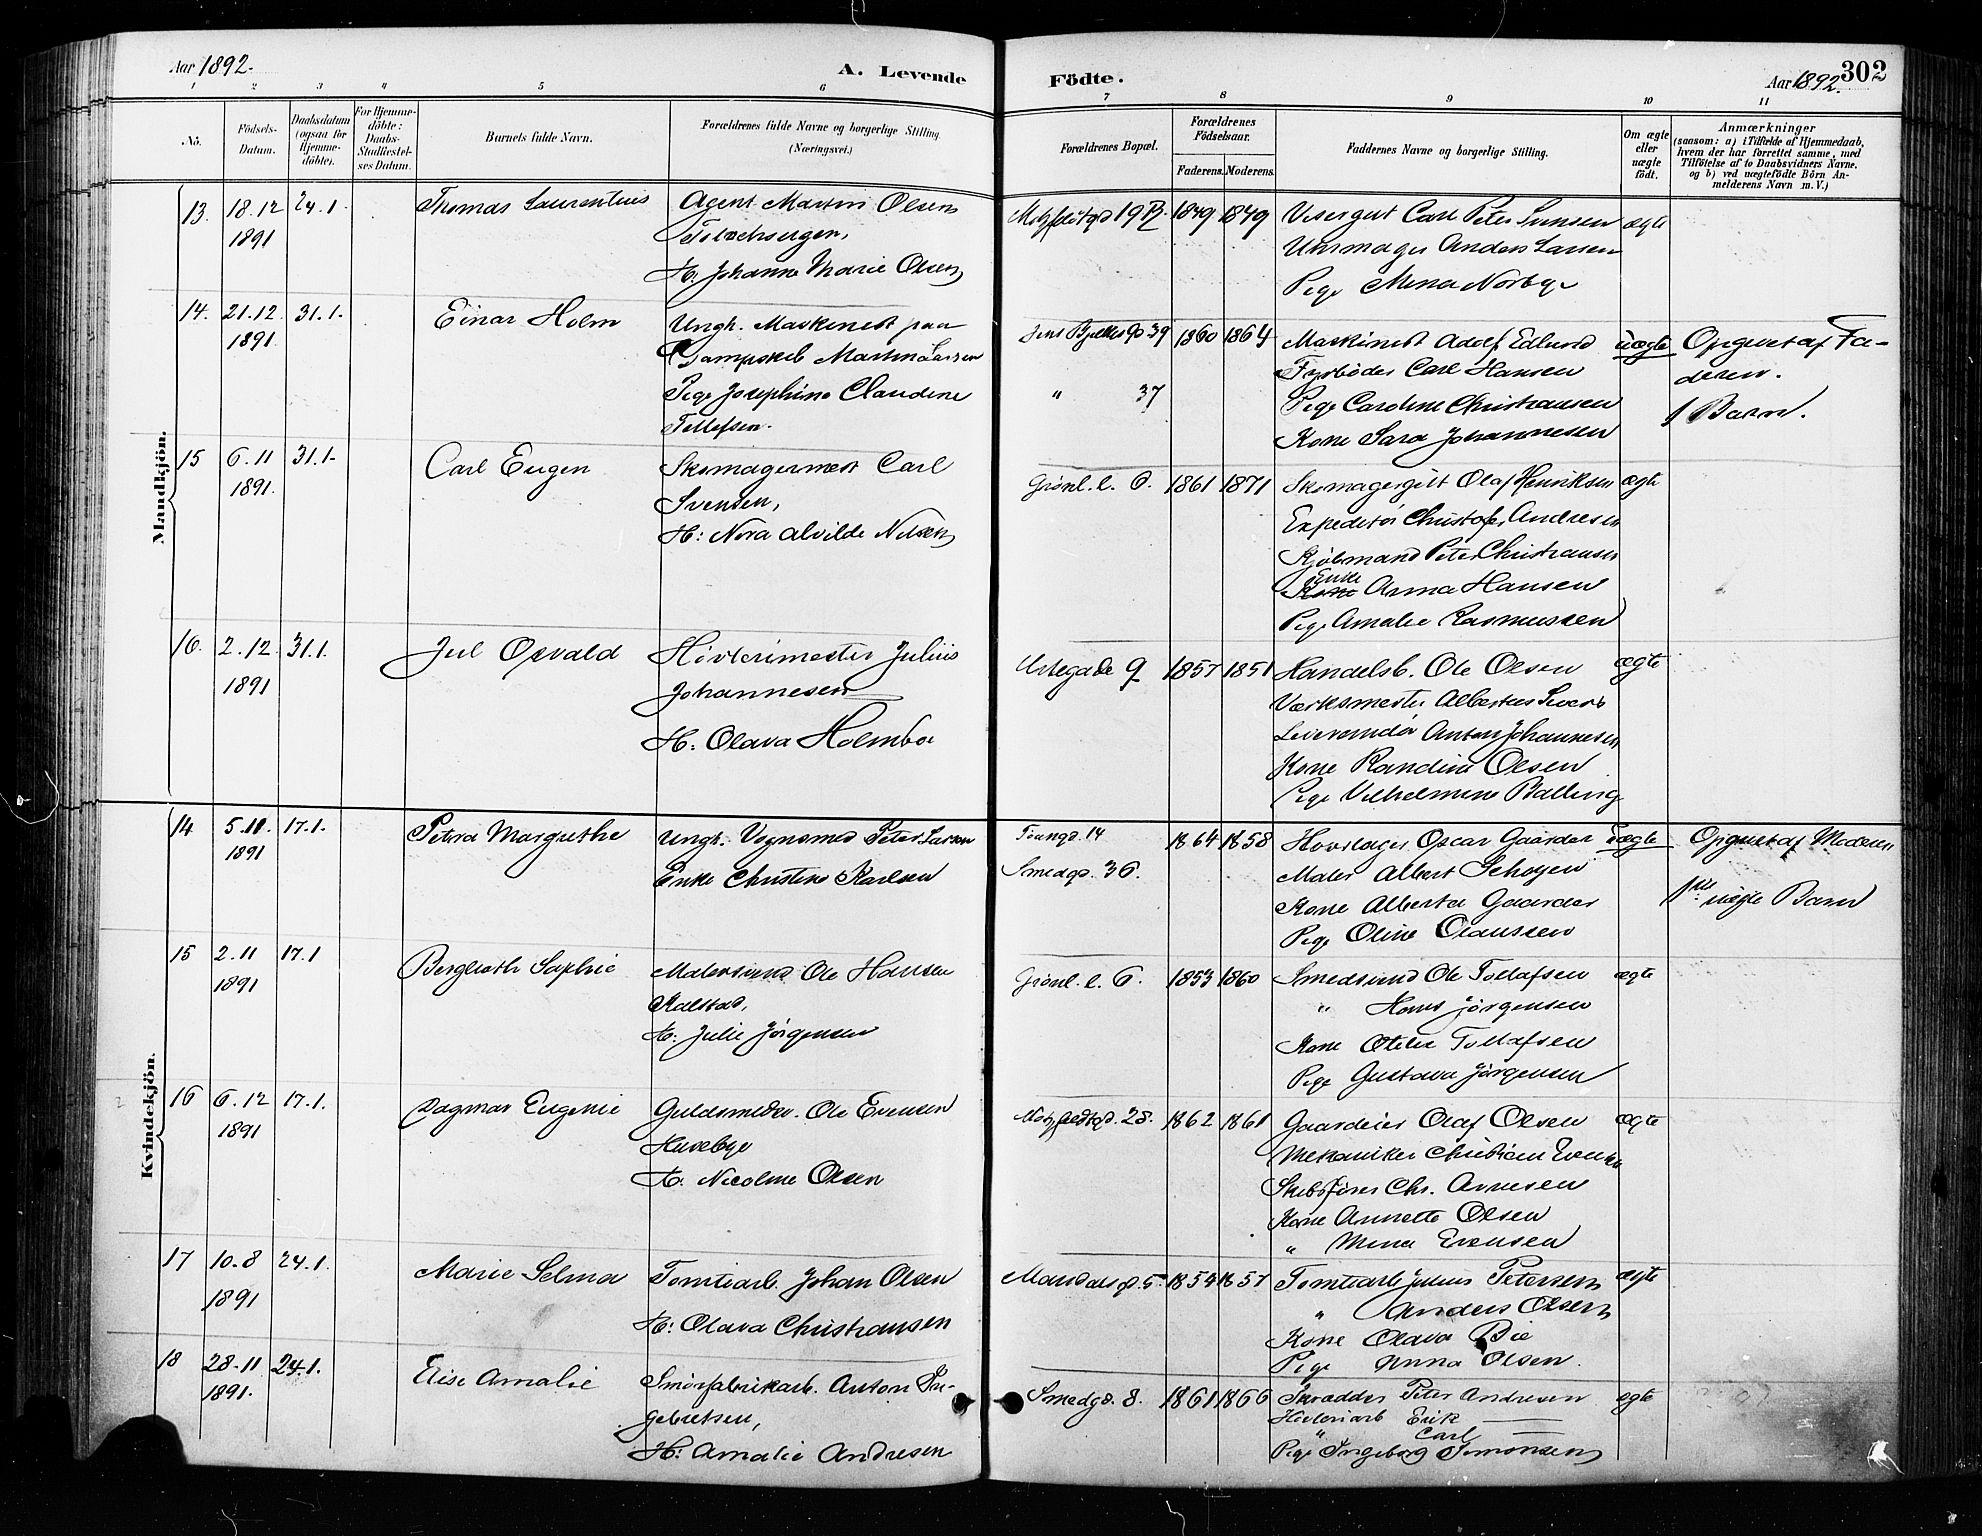 SAO, Grønland prestekontor Kirkebøker, F/Fa/L0009: Ministerialbok nr. 9, 1888-1893, s. 302